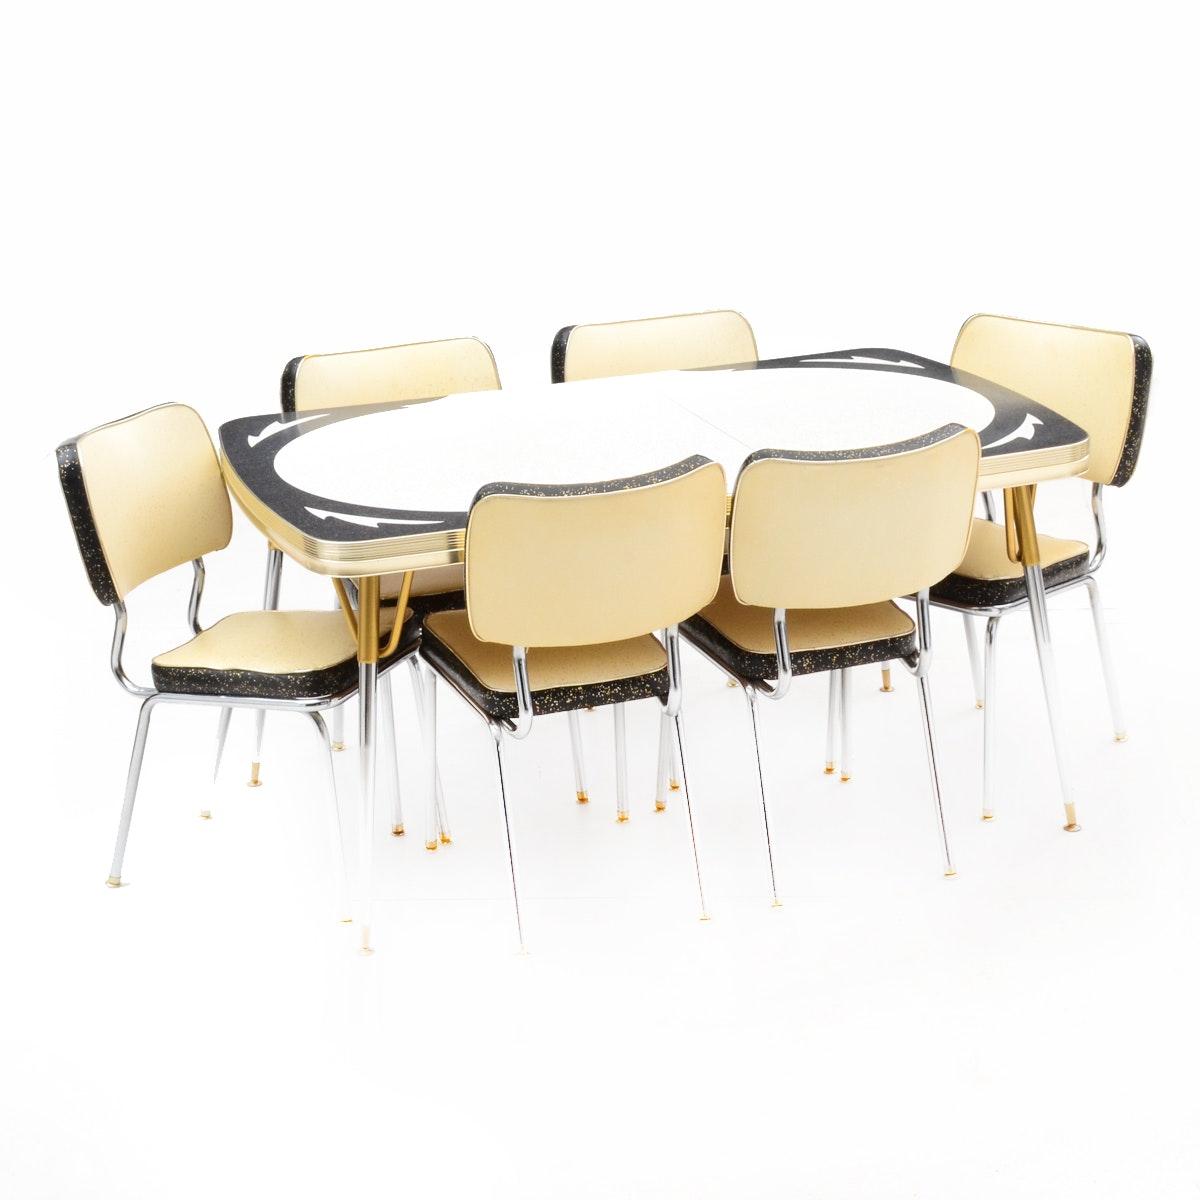 Mid Century Modern Dining Set by Kuehne